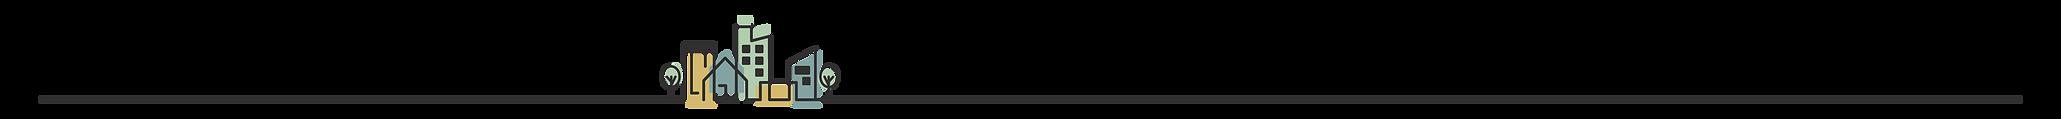 NDA Logo Symbol XLong.png